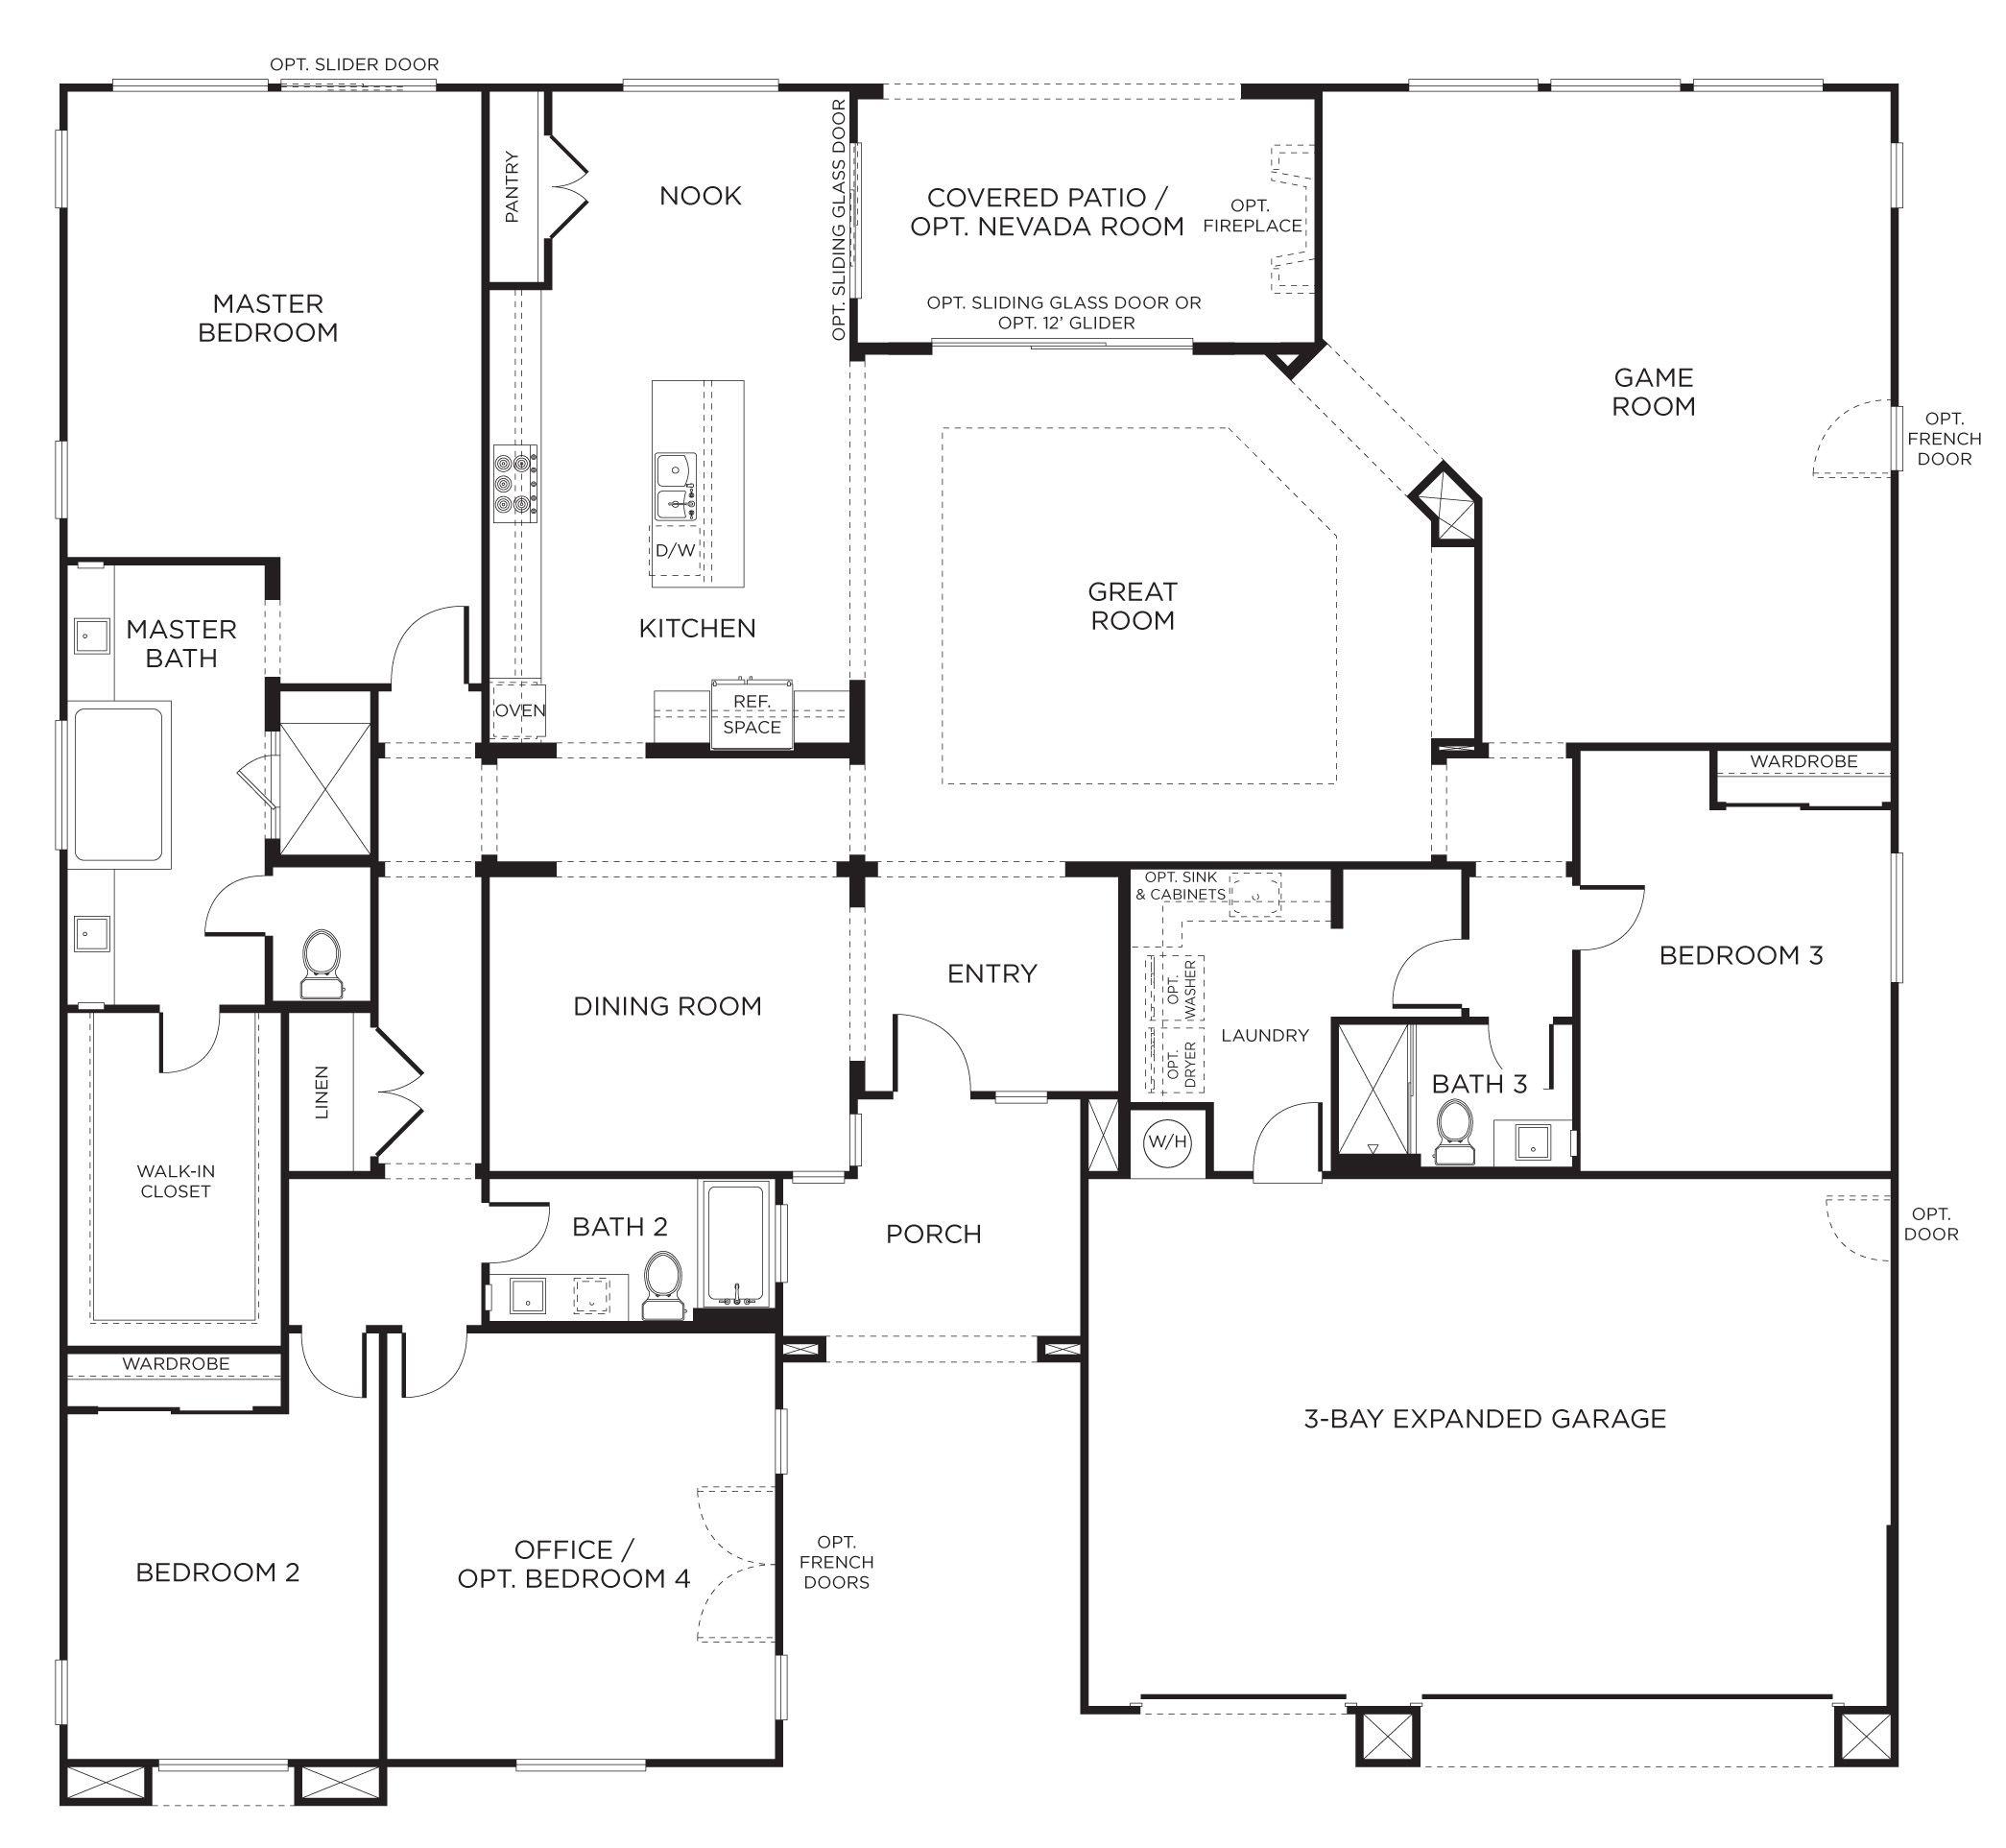 3 Bedroom 2 Bath House Plans 1 Story